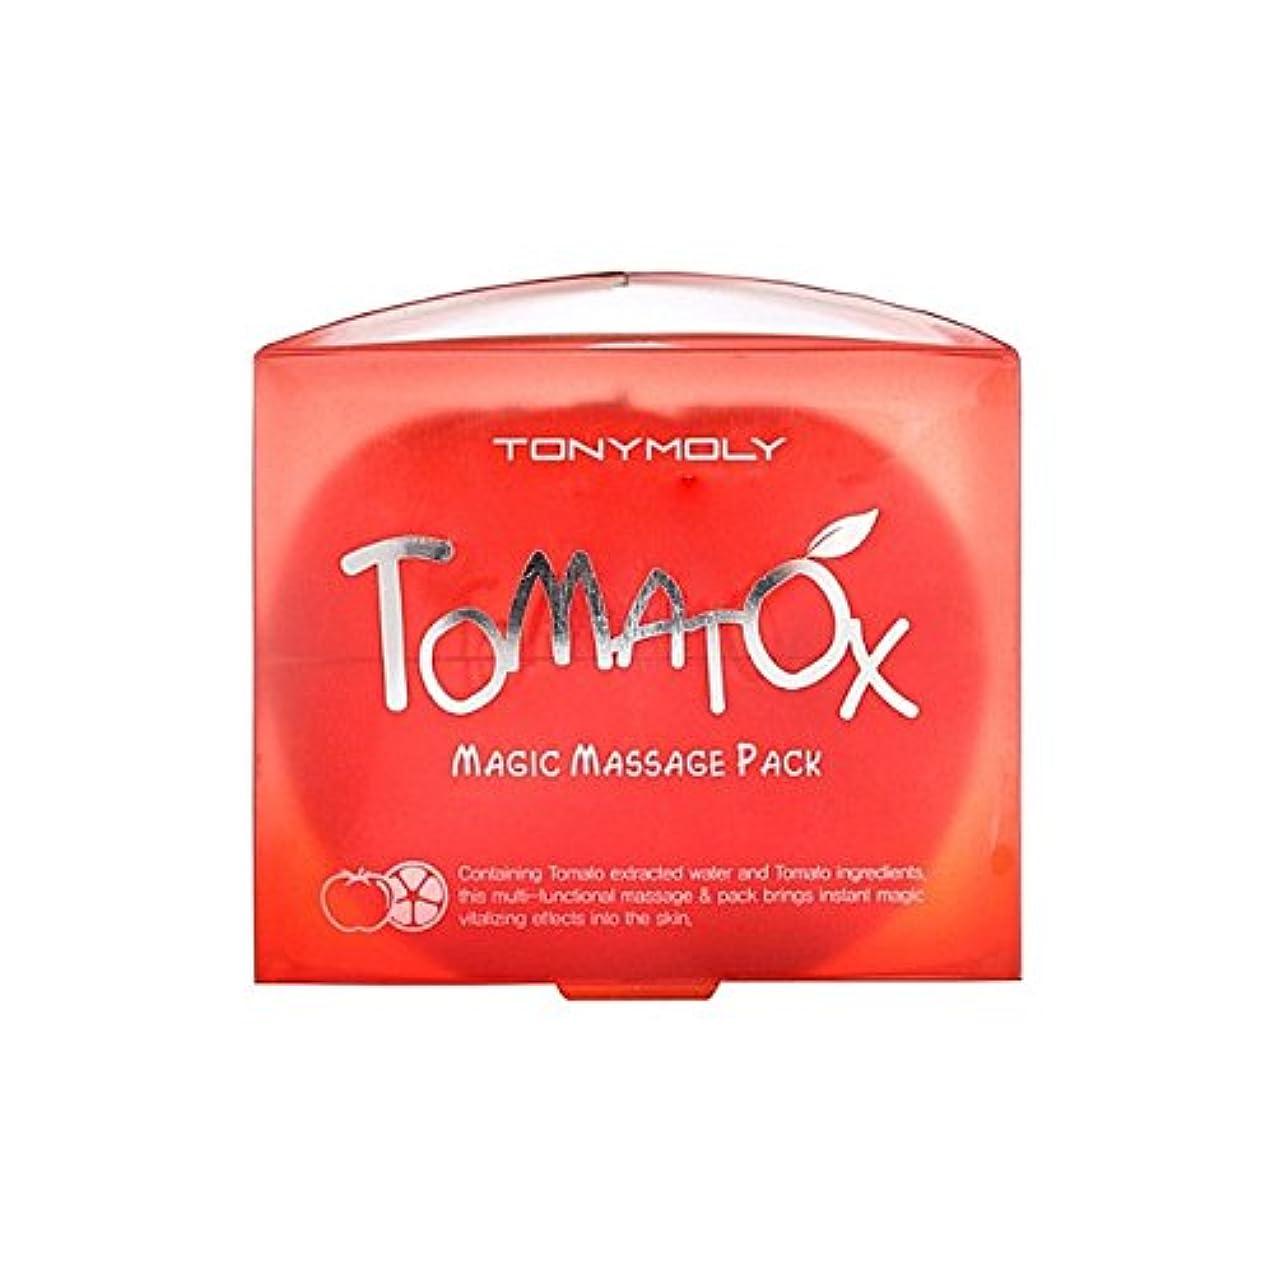 Tony Moly Tomatox Magic Massage Pack 80G (Pack of 6) - トニーモリー魔法マッサージパック80グラム x6 [並行輸入品]